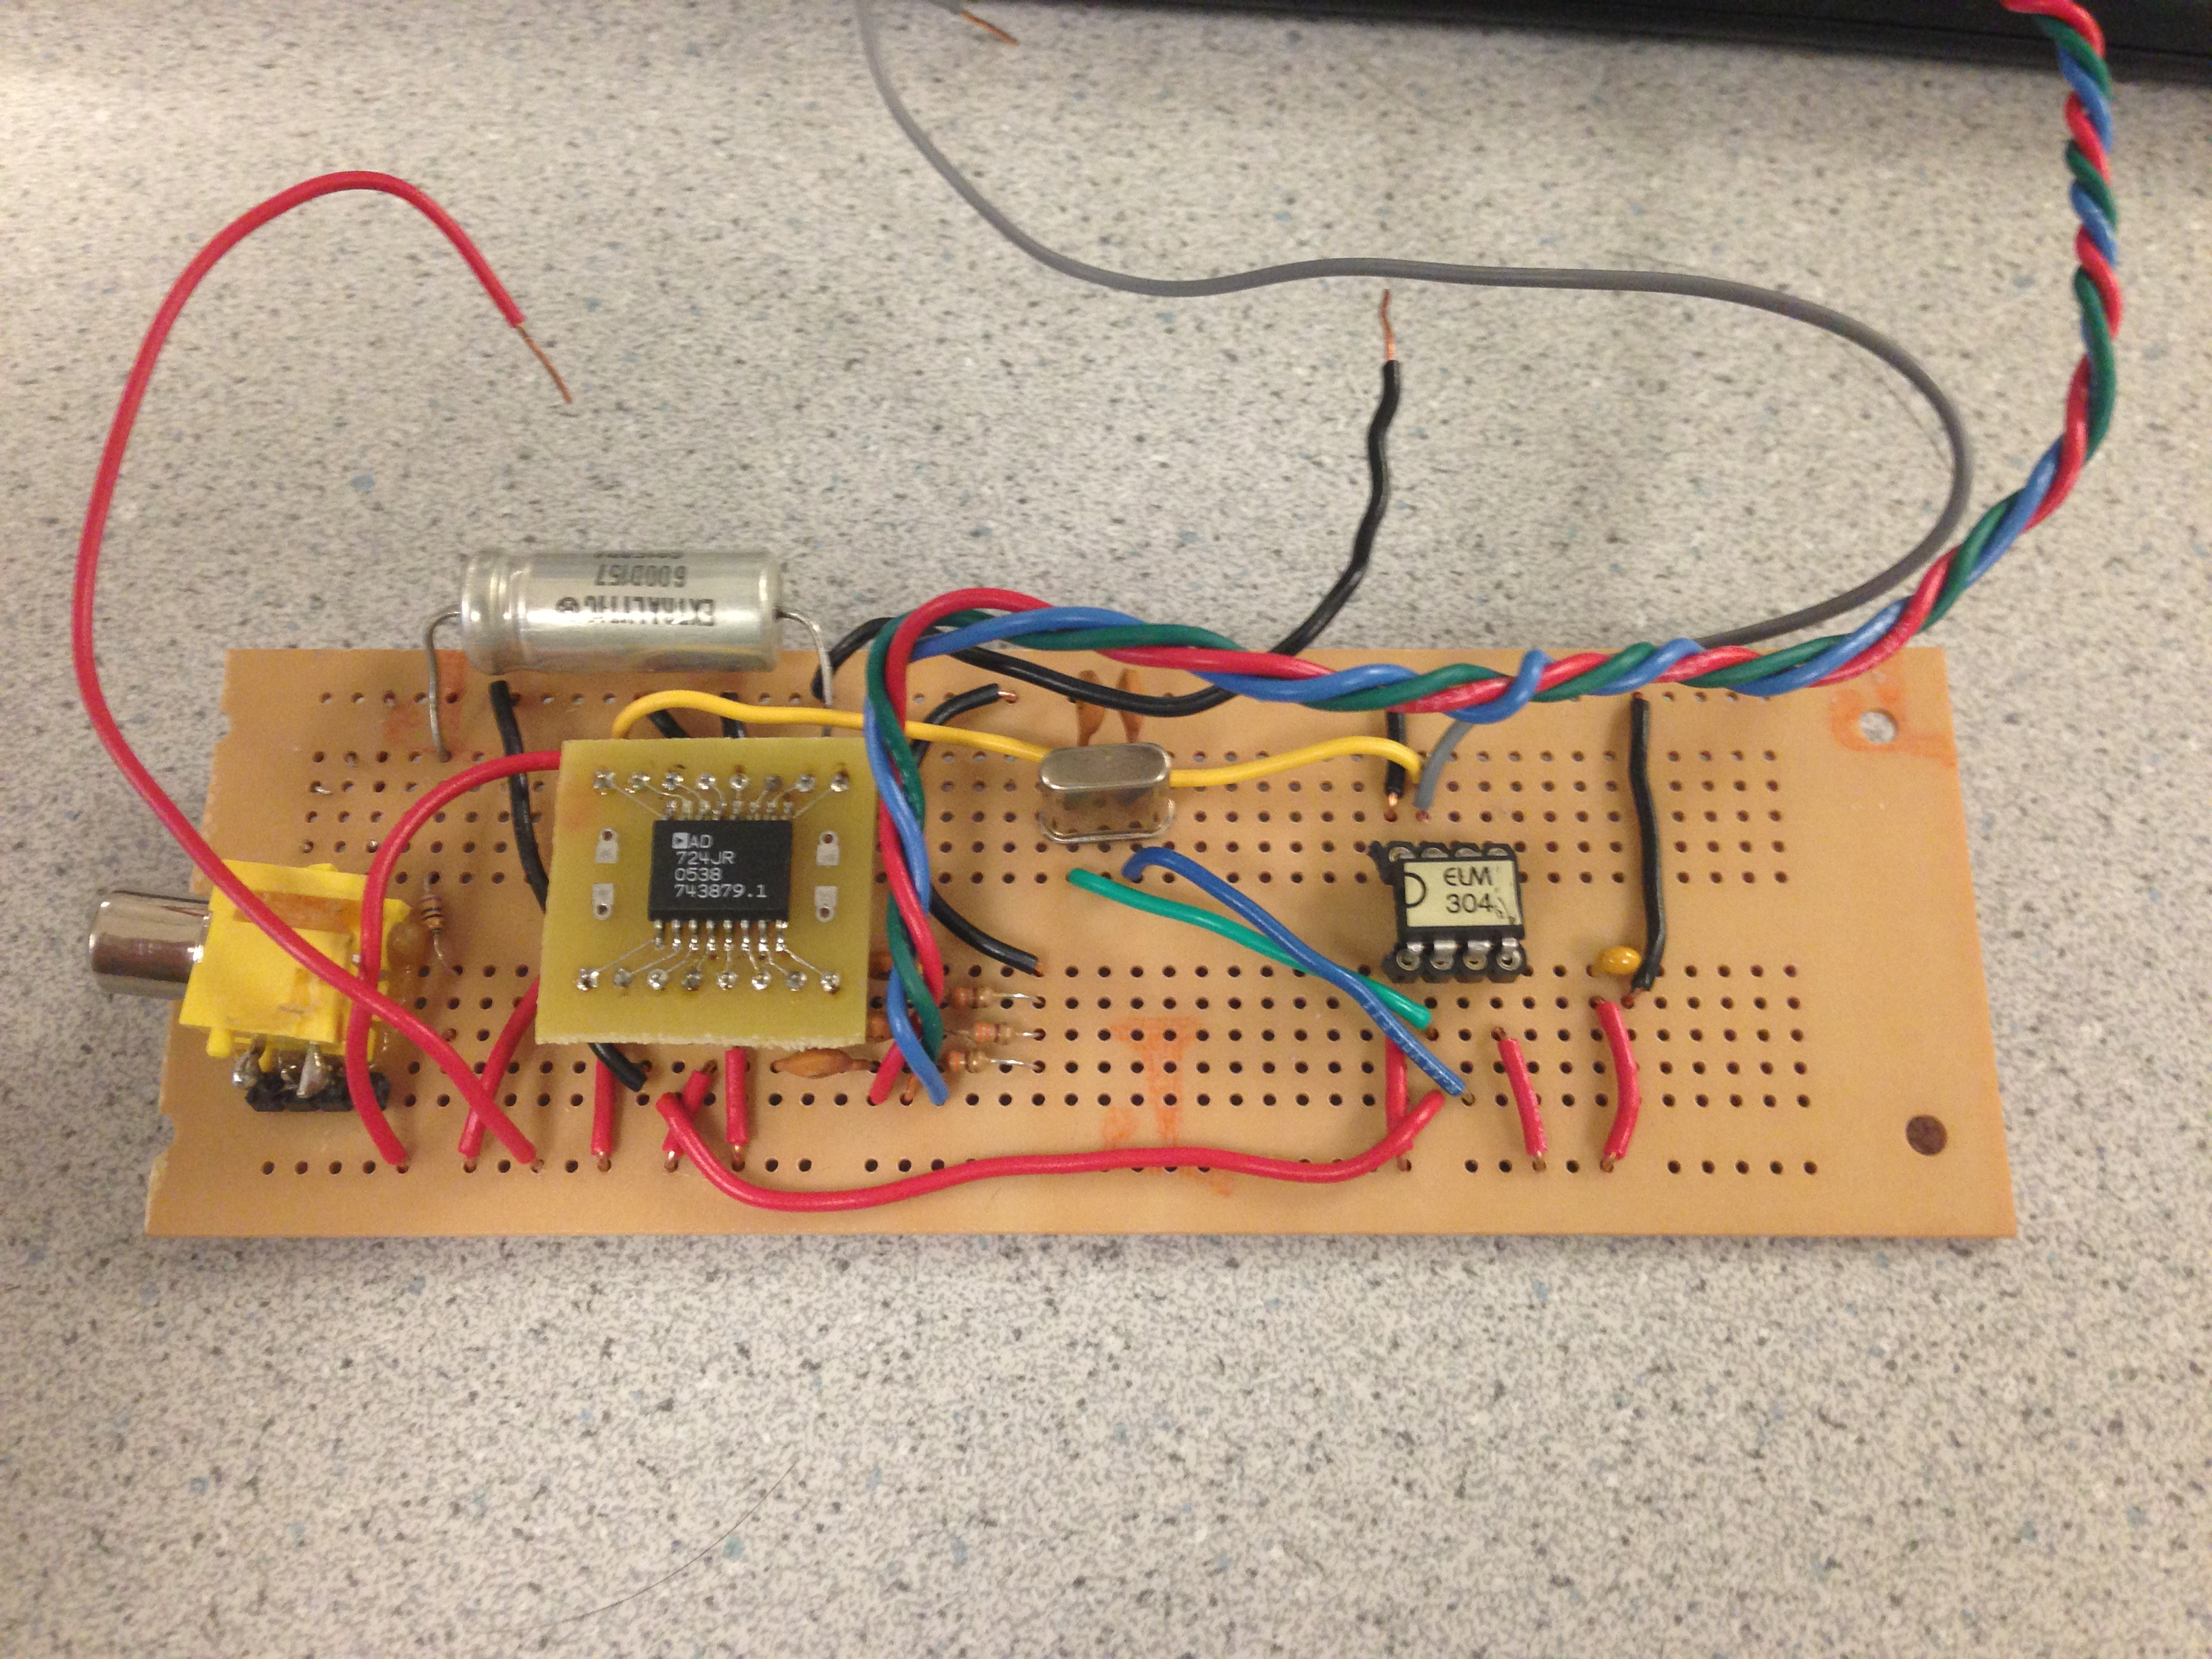 Ece 4760 Audio Spectrum Analyzer Circuit Electronic Design Color Video Generation